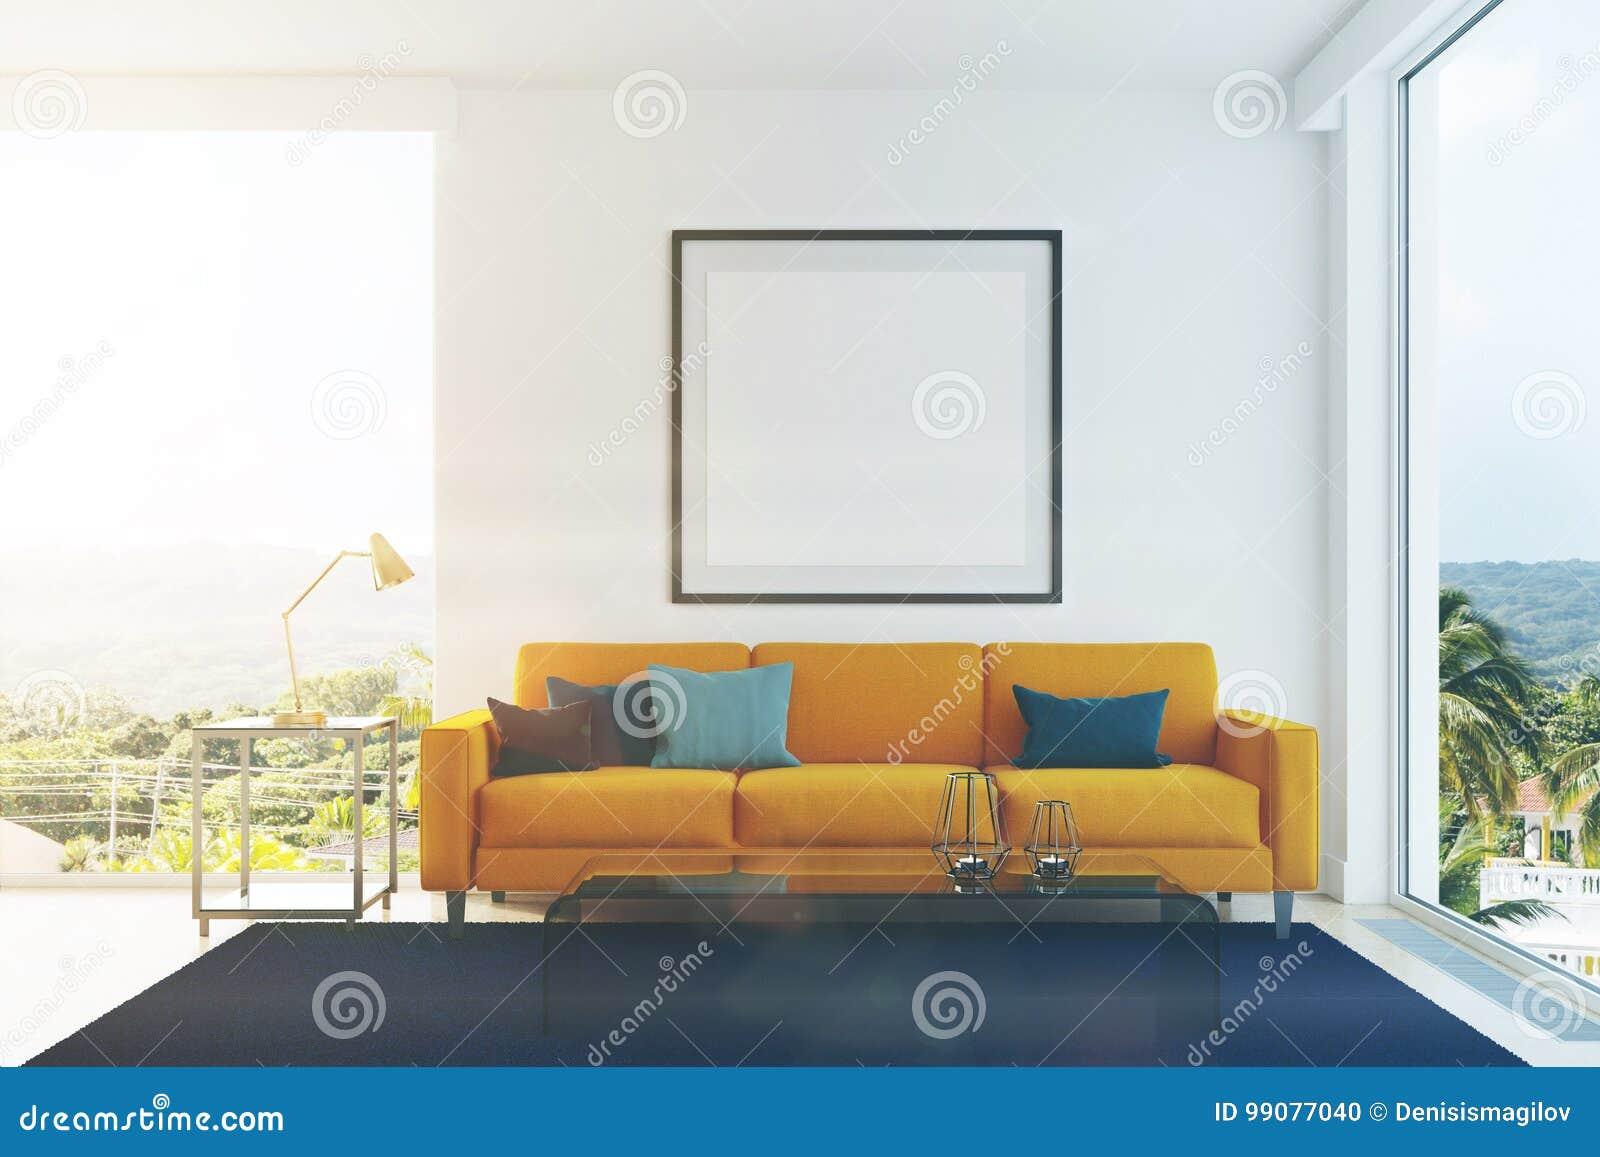 Gelbes Sofa, Blau Pillows Das Getonte Wohnzimmer Stock Abbildung ...